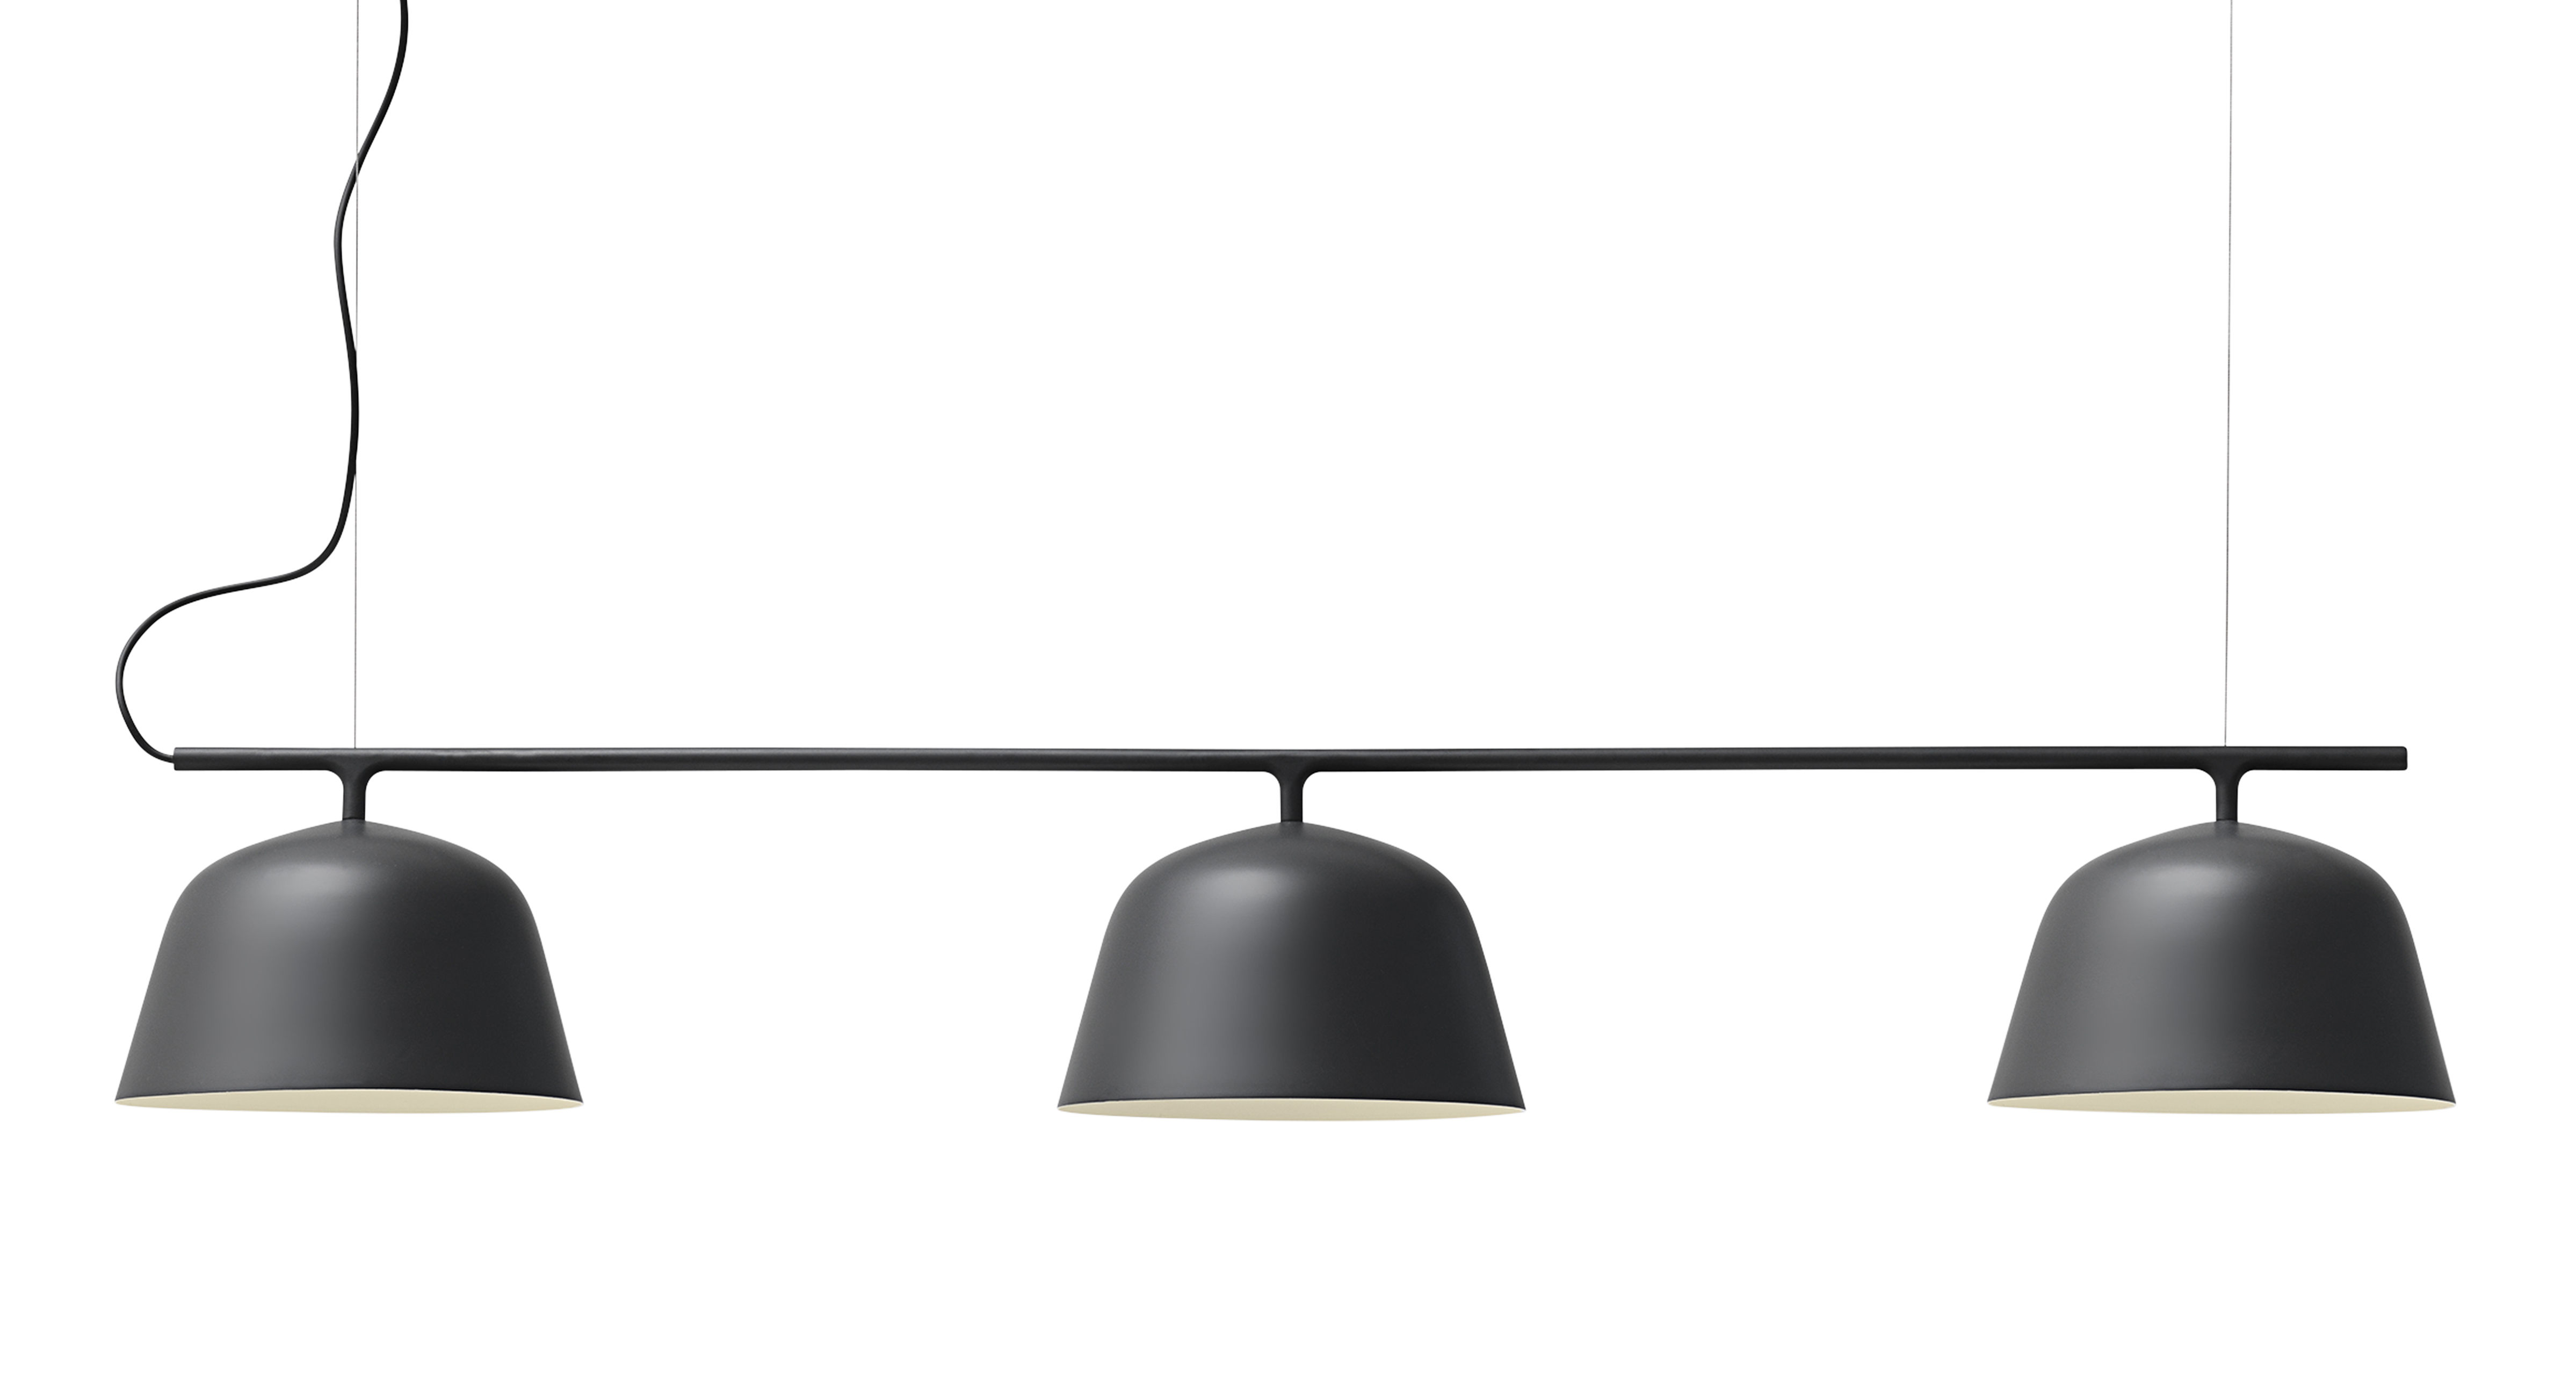 Leuchten - Pendelleuchten - Ambit Rail Pendelleuchte / L 126 cm - Muuto - Schwarz - Aluminium